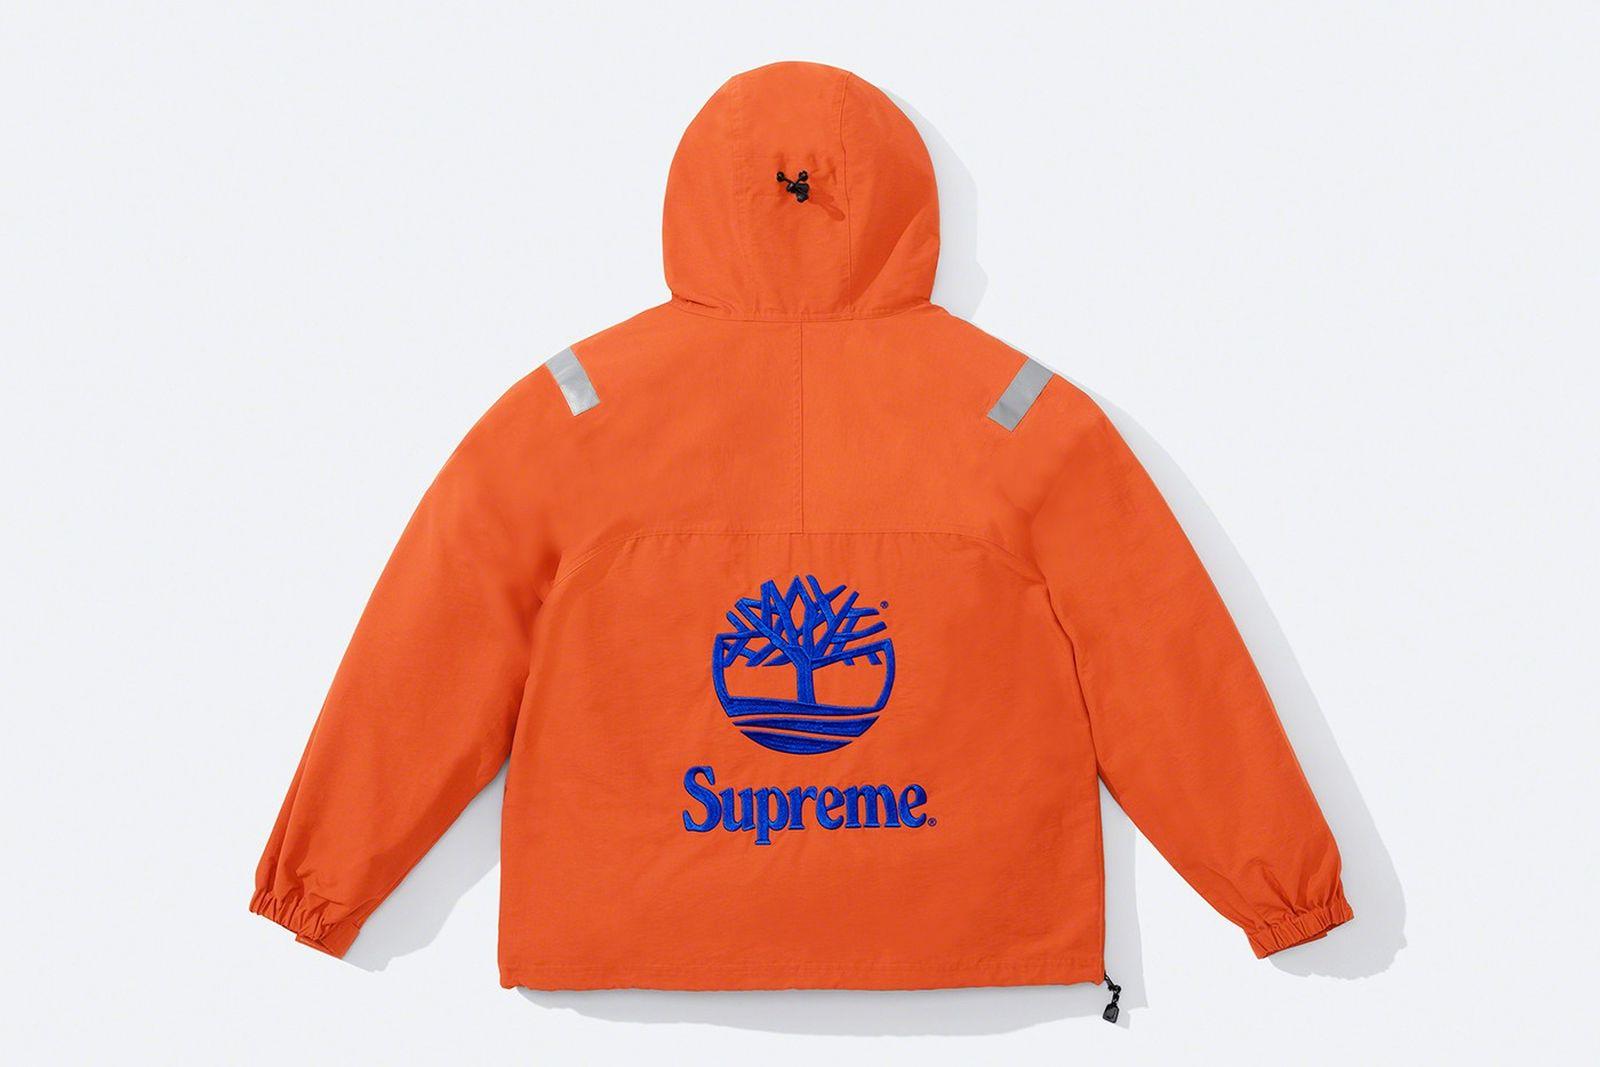 supreme-x-timberland-collaboration-ss-21-10